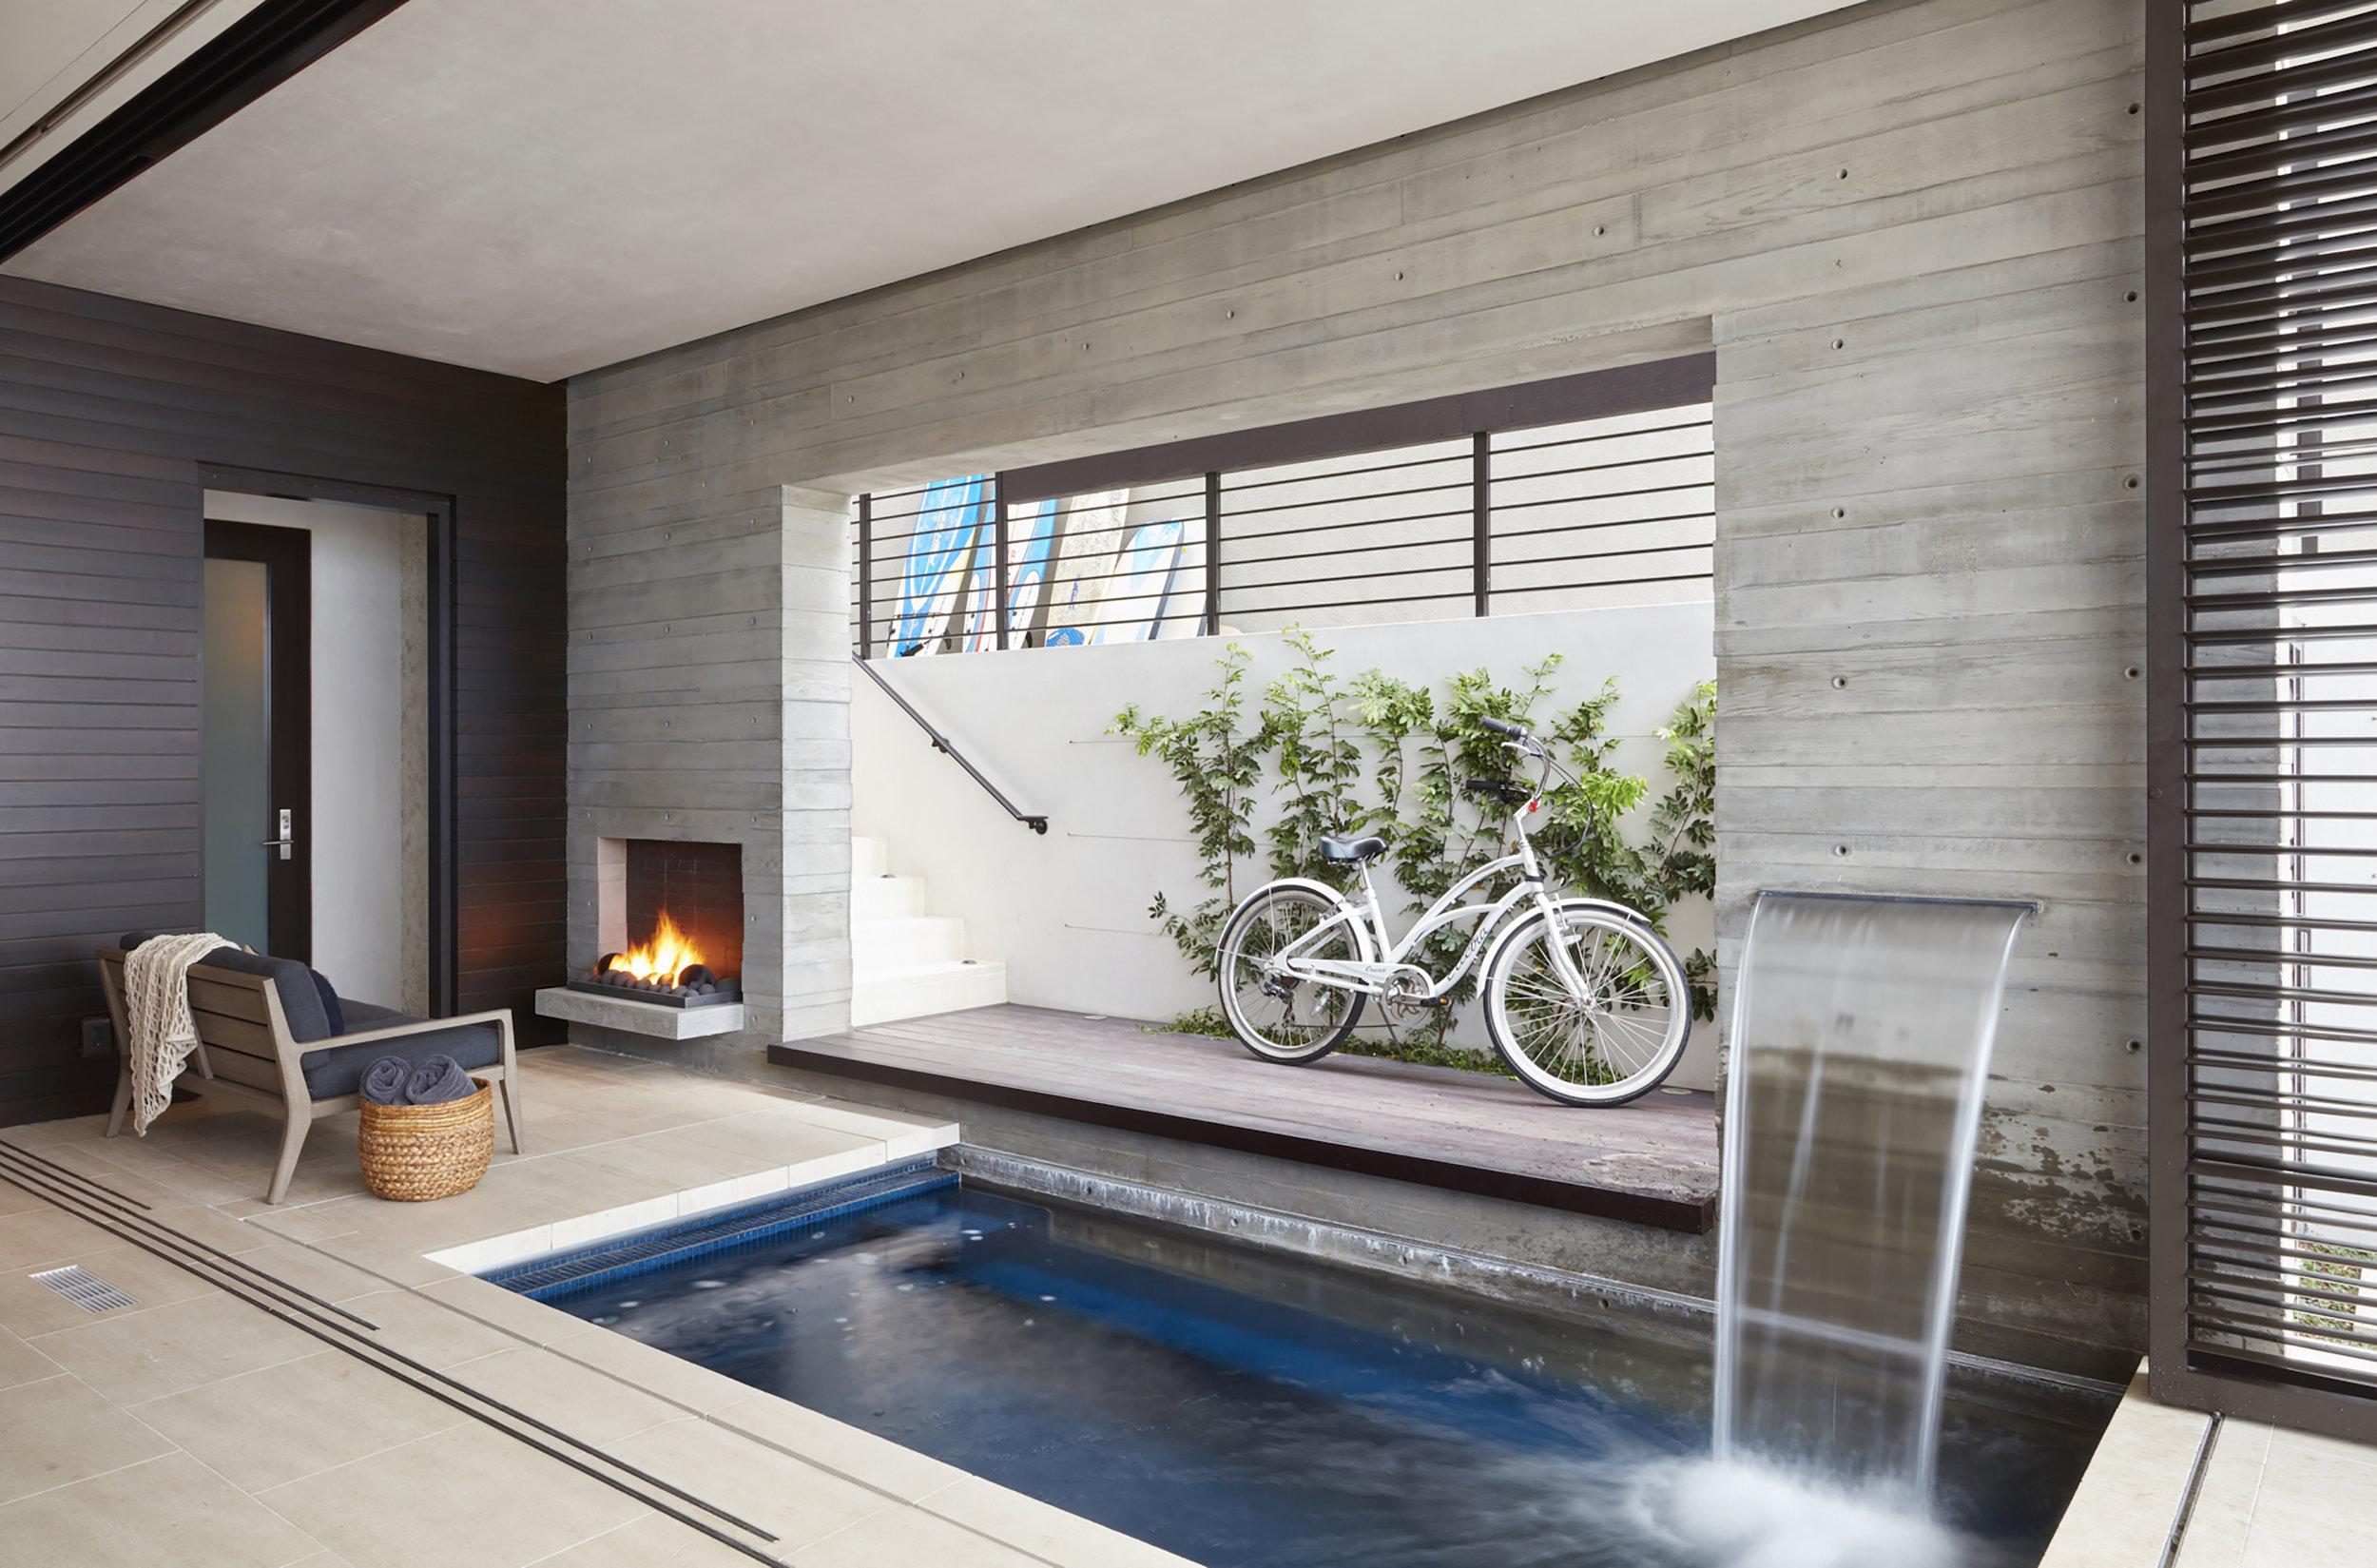 42++308+Beach+Room+Pool.jpg